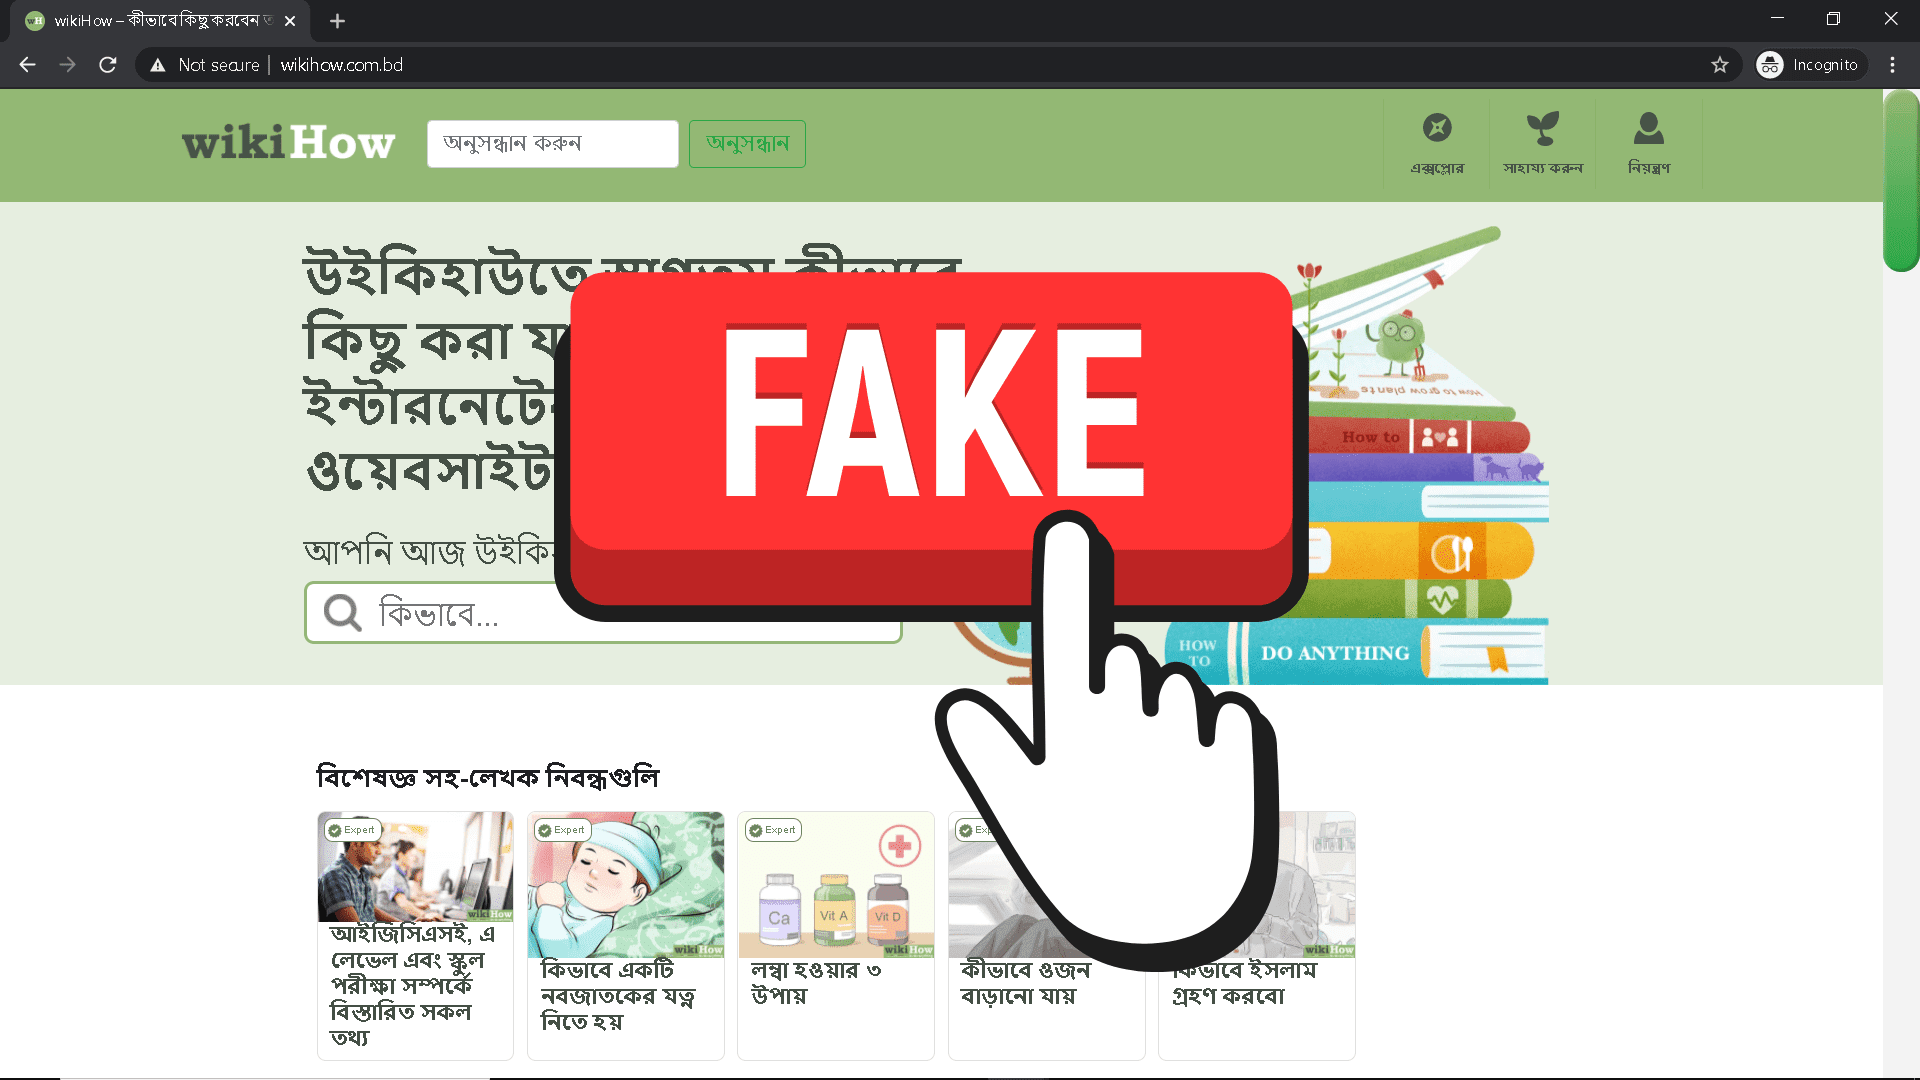 Fake wikiHow Bangla Website